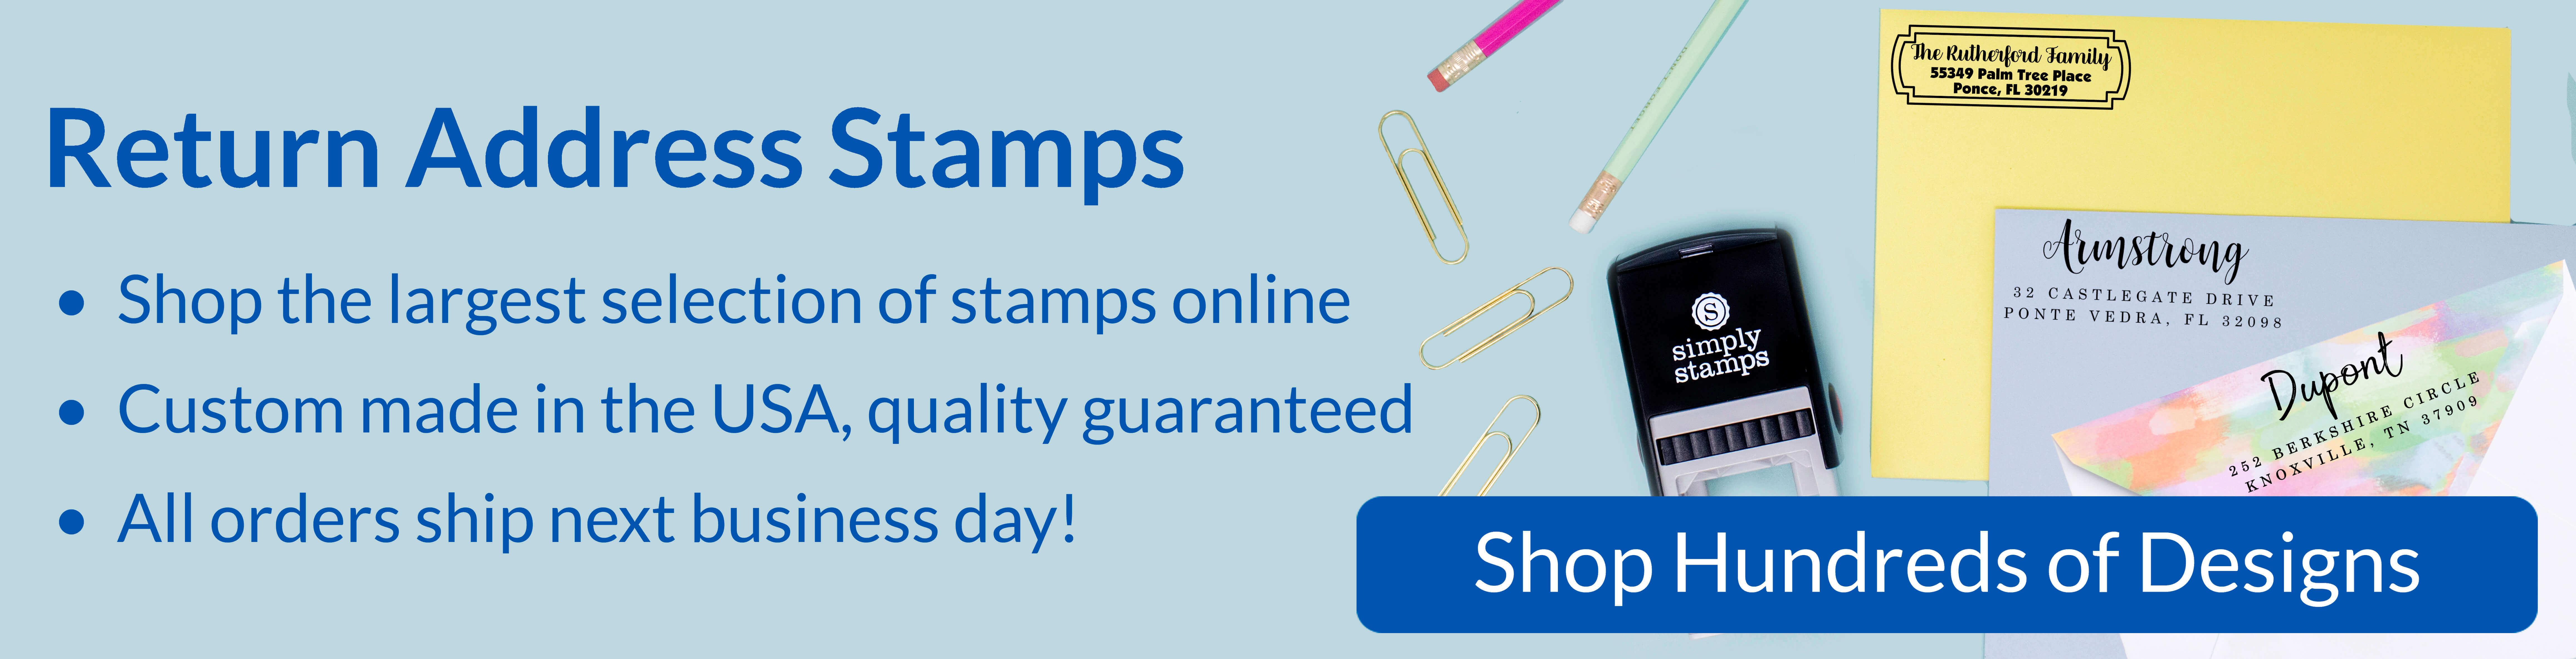 custom address stamps fast